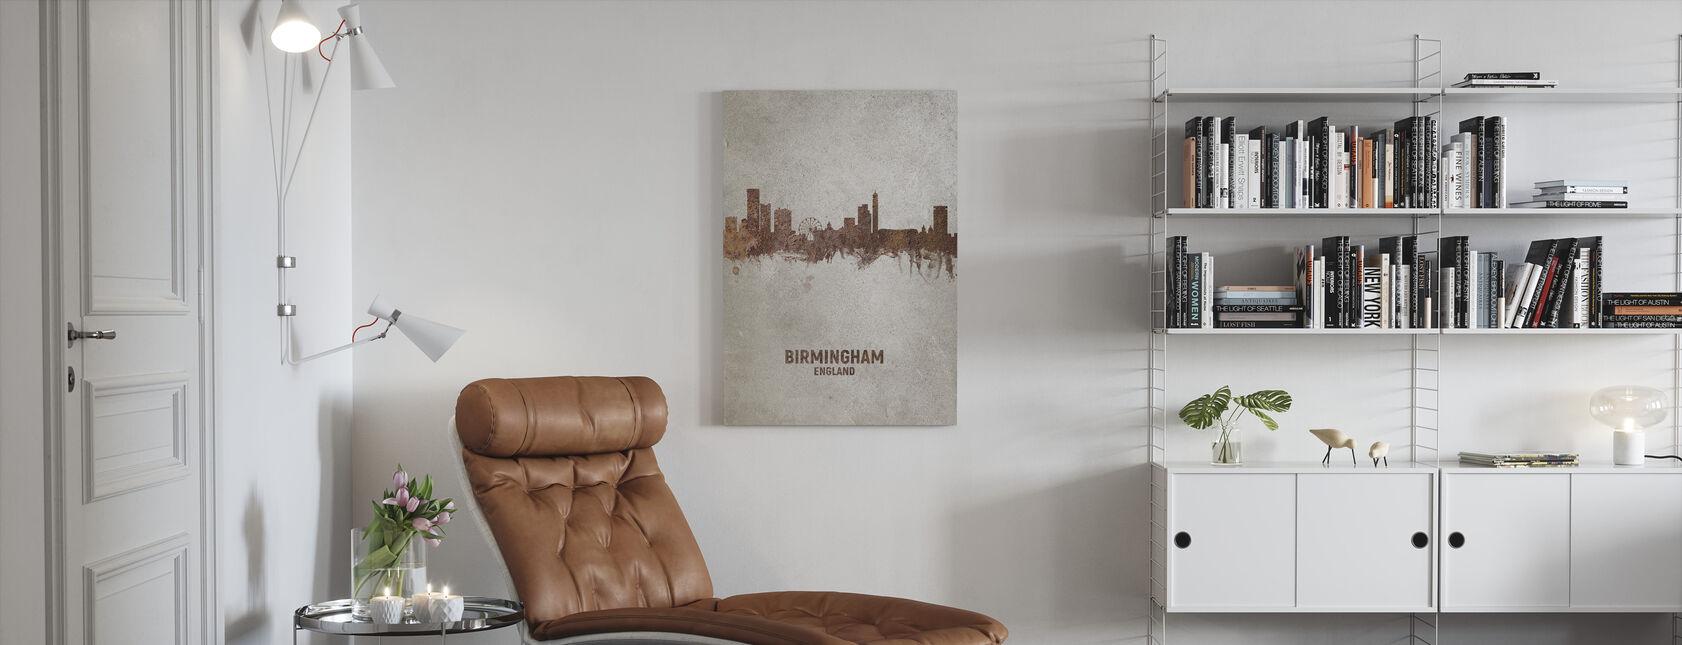 Birmingham Angleterre Rust Skyline - Impression sur toile - Salle à manger